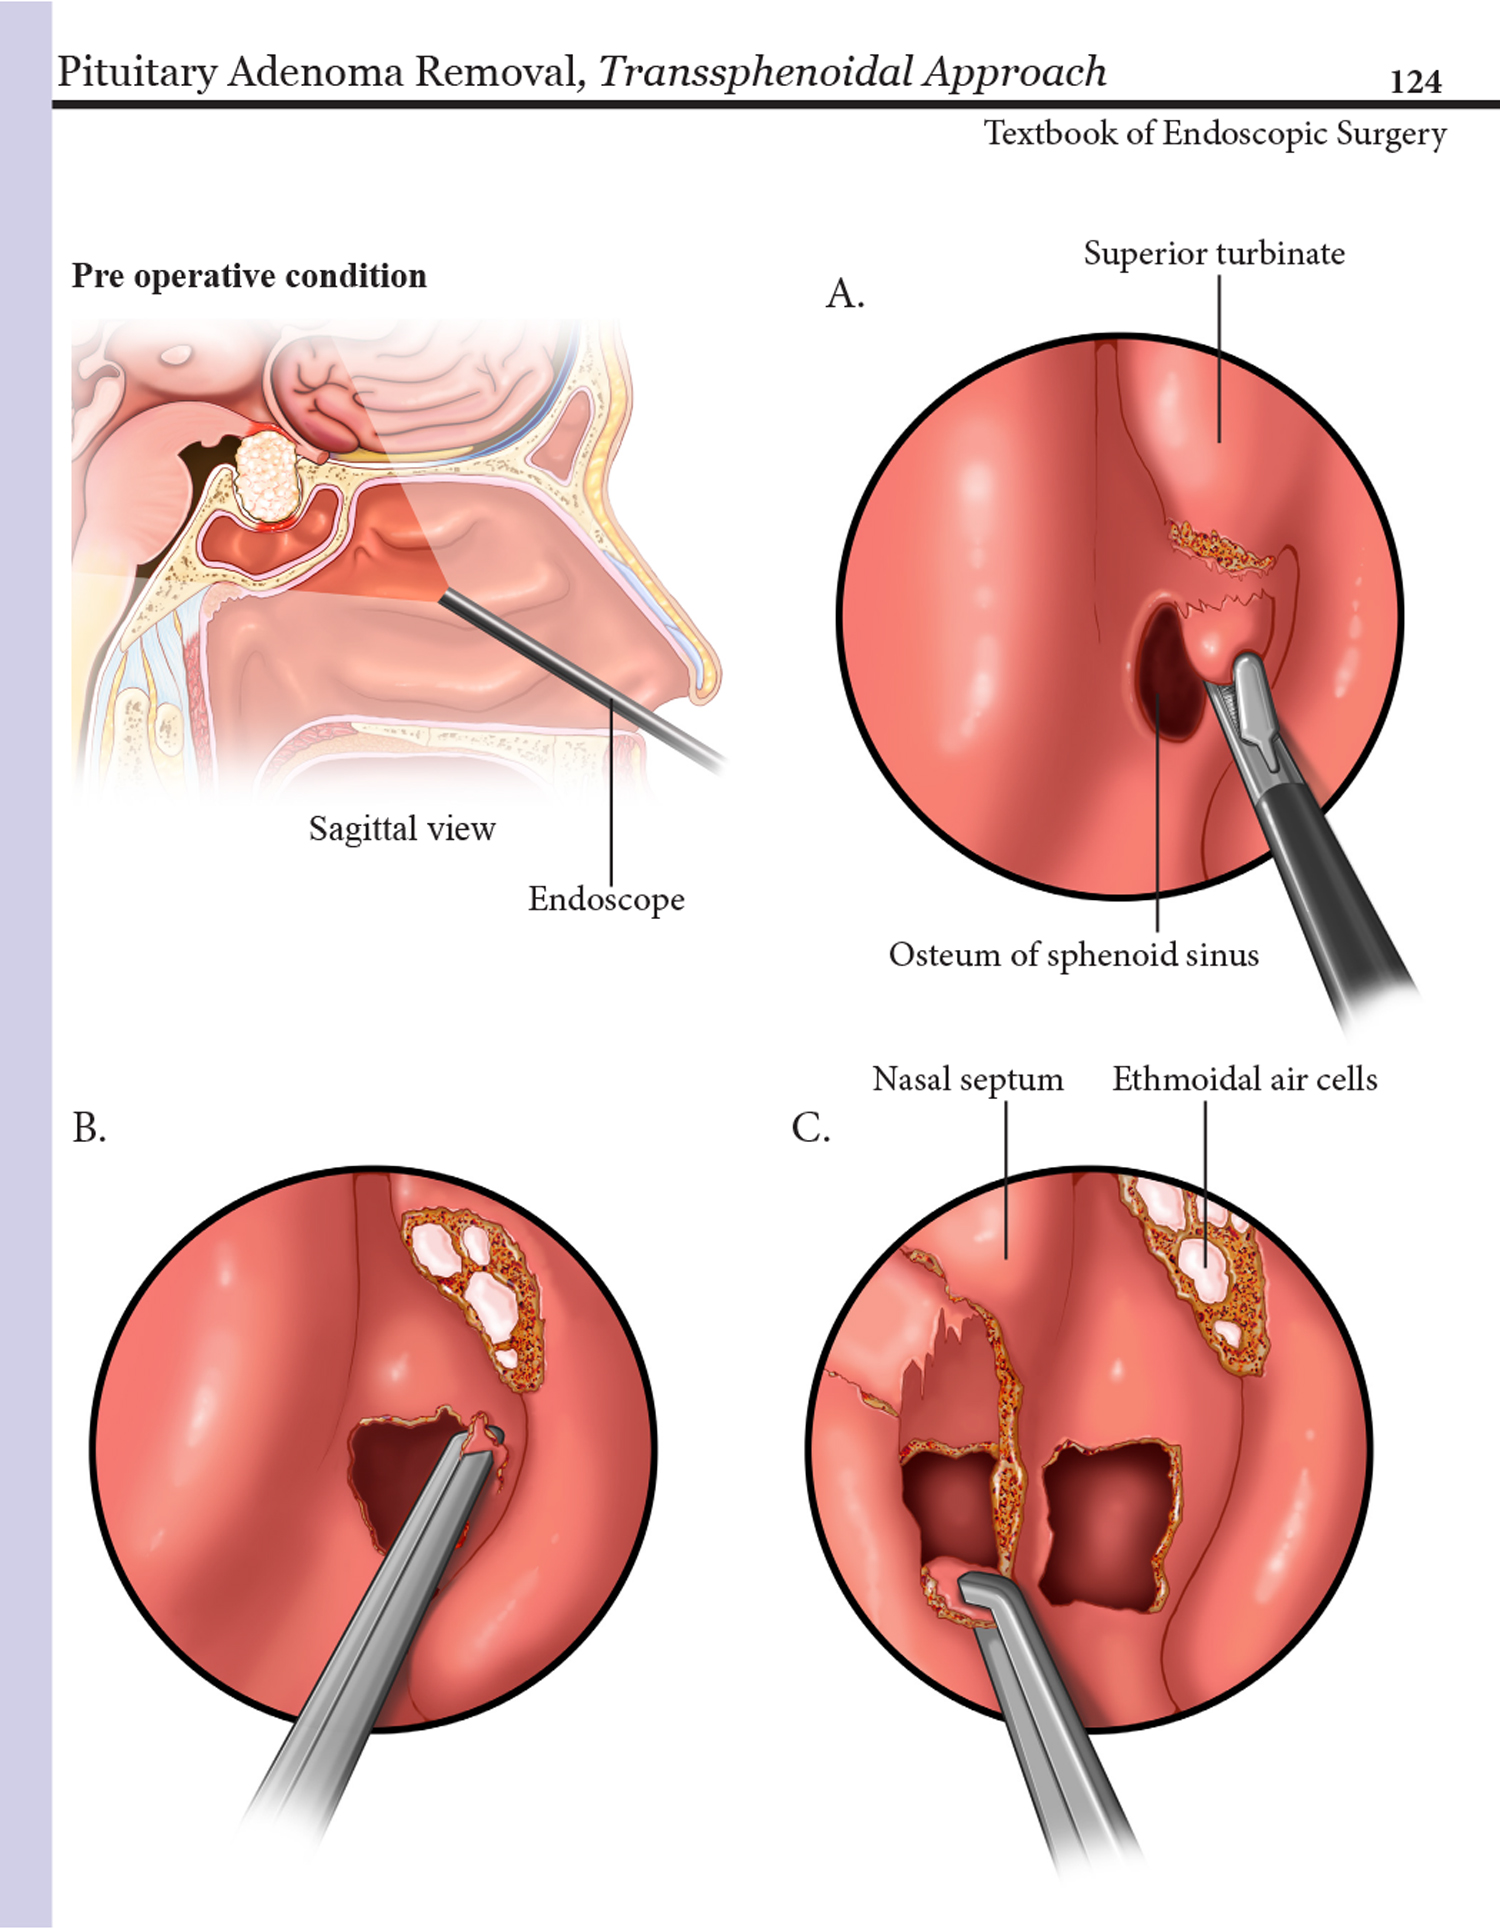 Ptuitary1.jpg